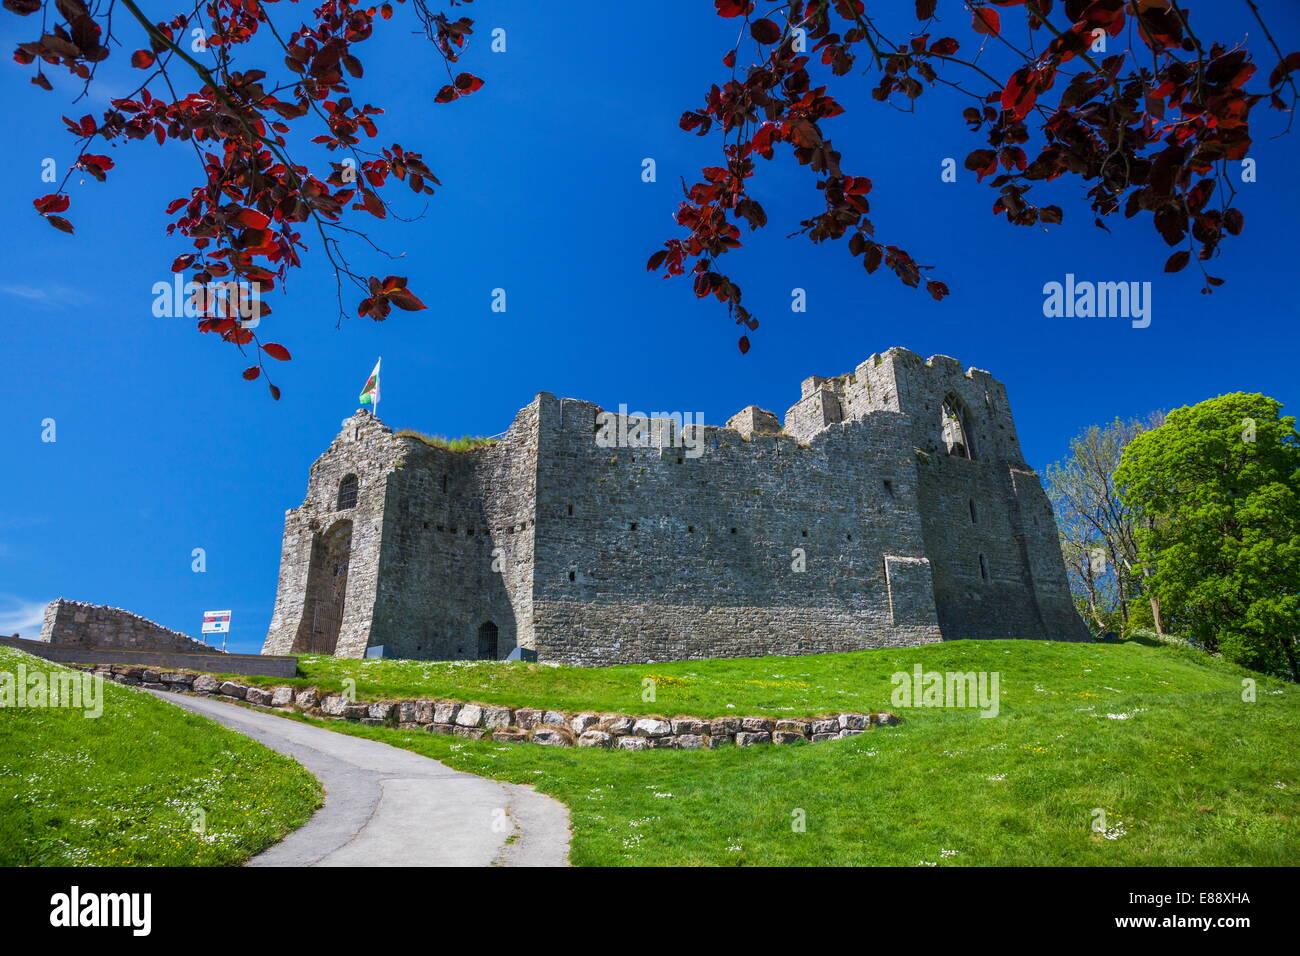 Château d'Oystermouth, marmonne, Gower, Pays de Galles, Royaume-Uni, Europe Photo Stock